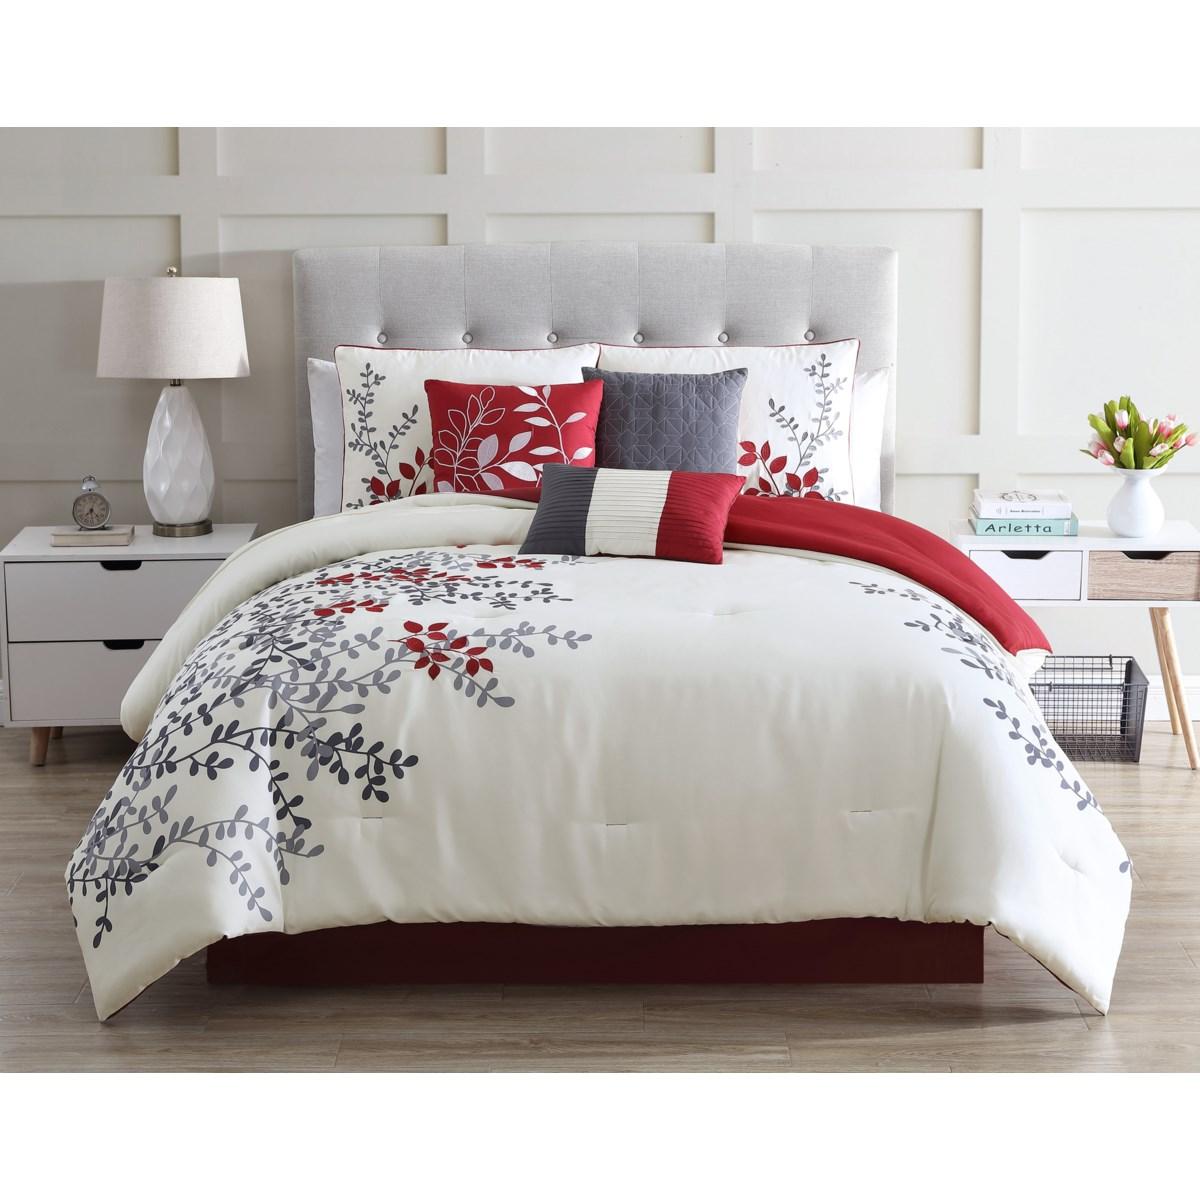 Prendle 7 PC King Comforter Set